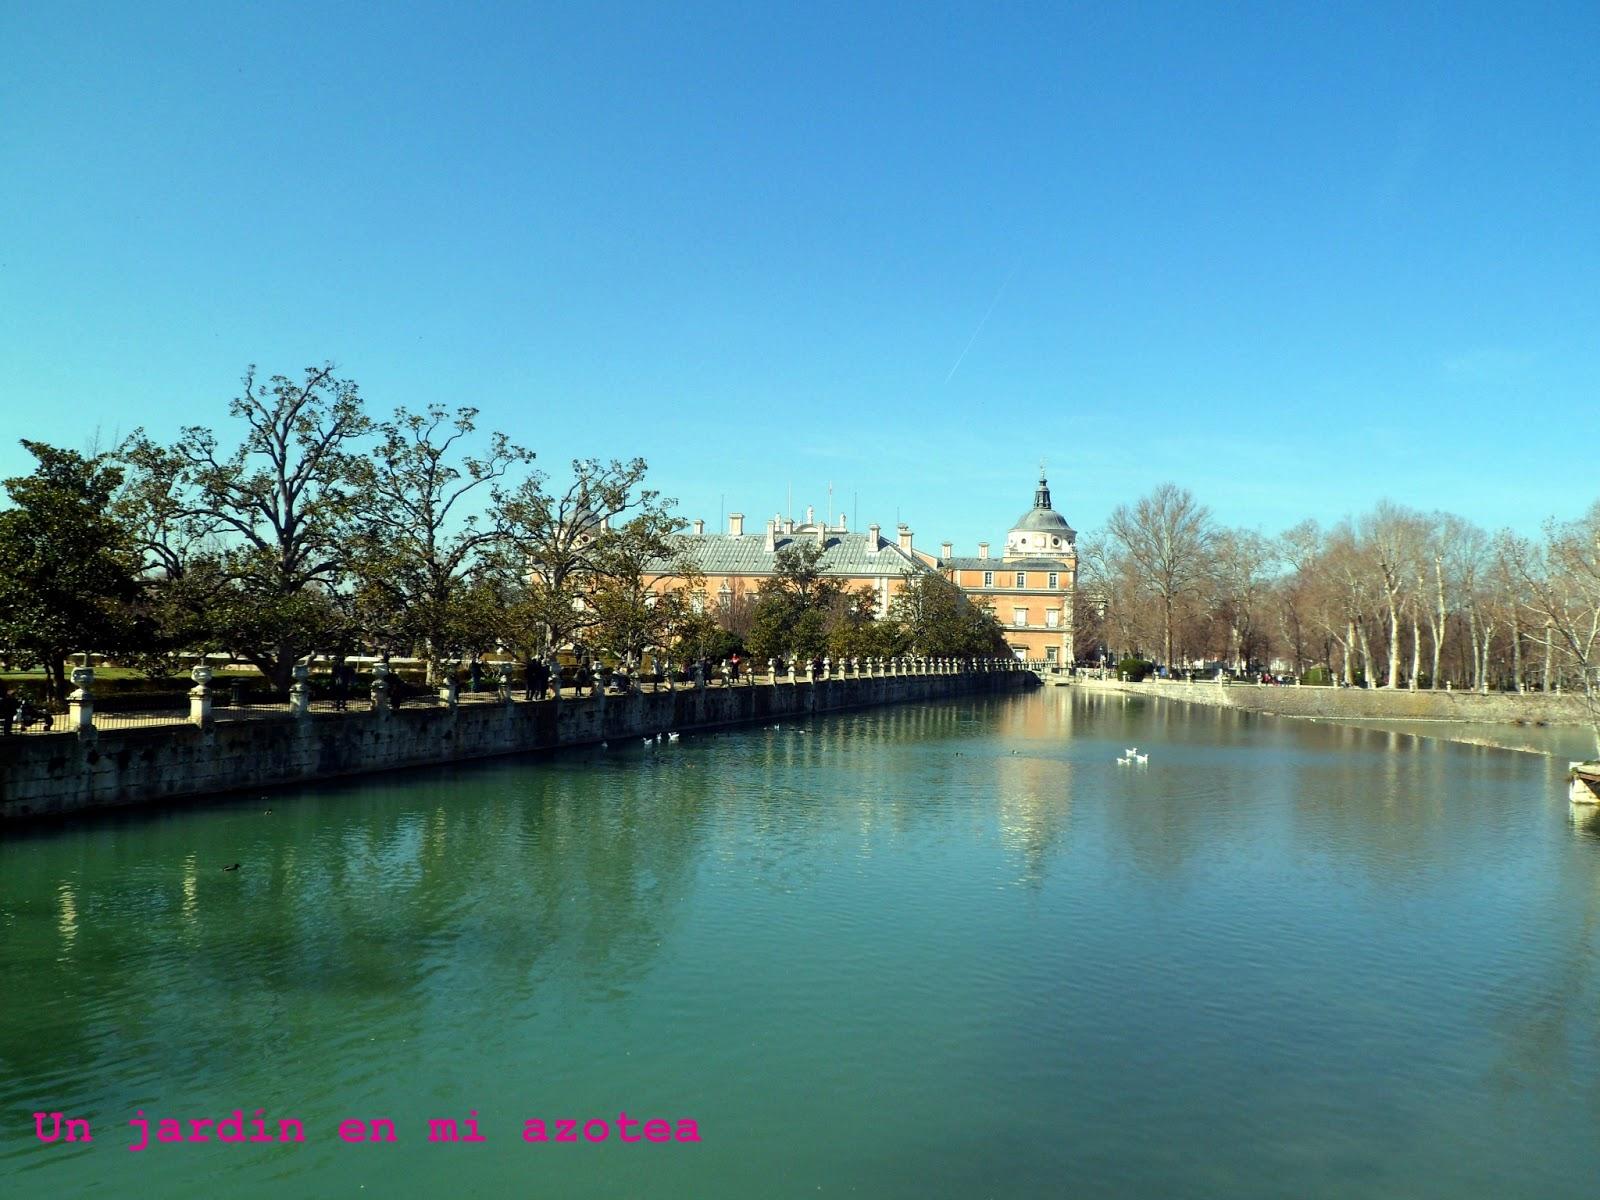 Un jard n en mi azotea el jard n de la isla de aranjuez for Jardin de la isla aranjuez